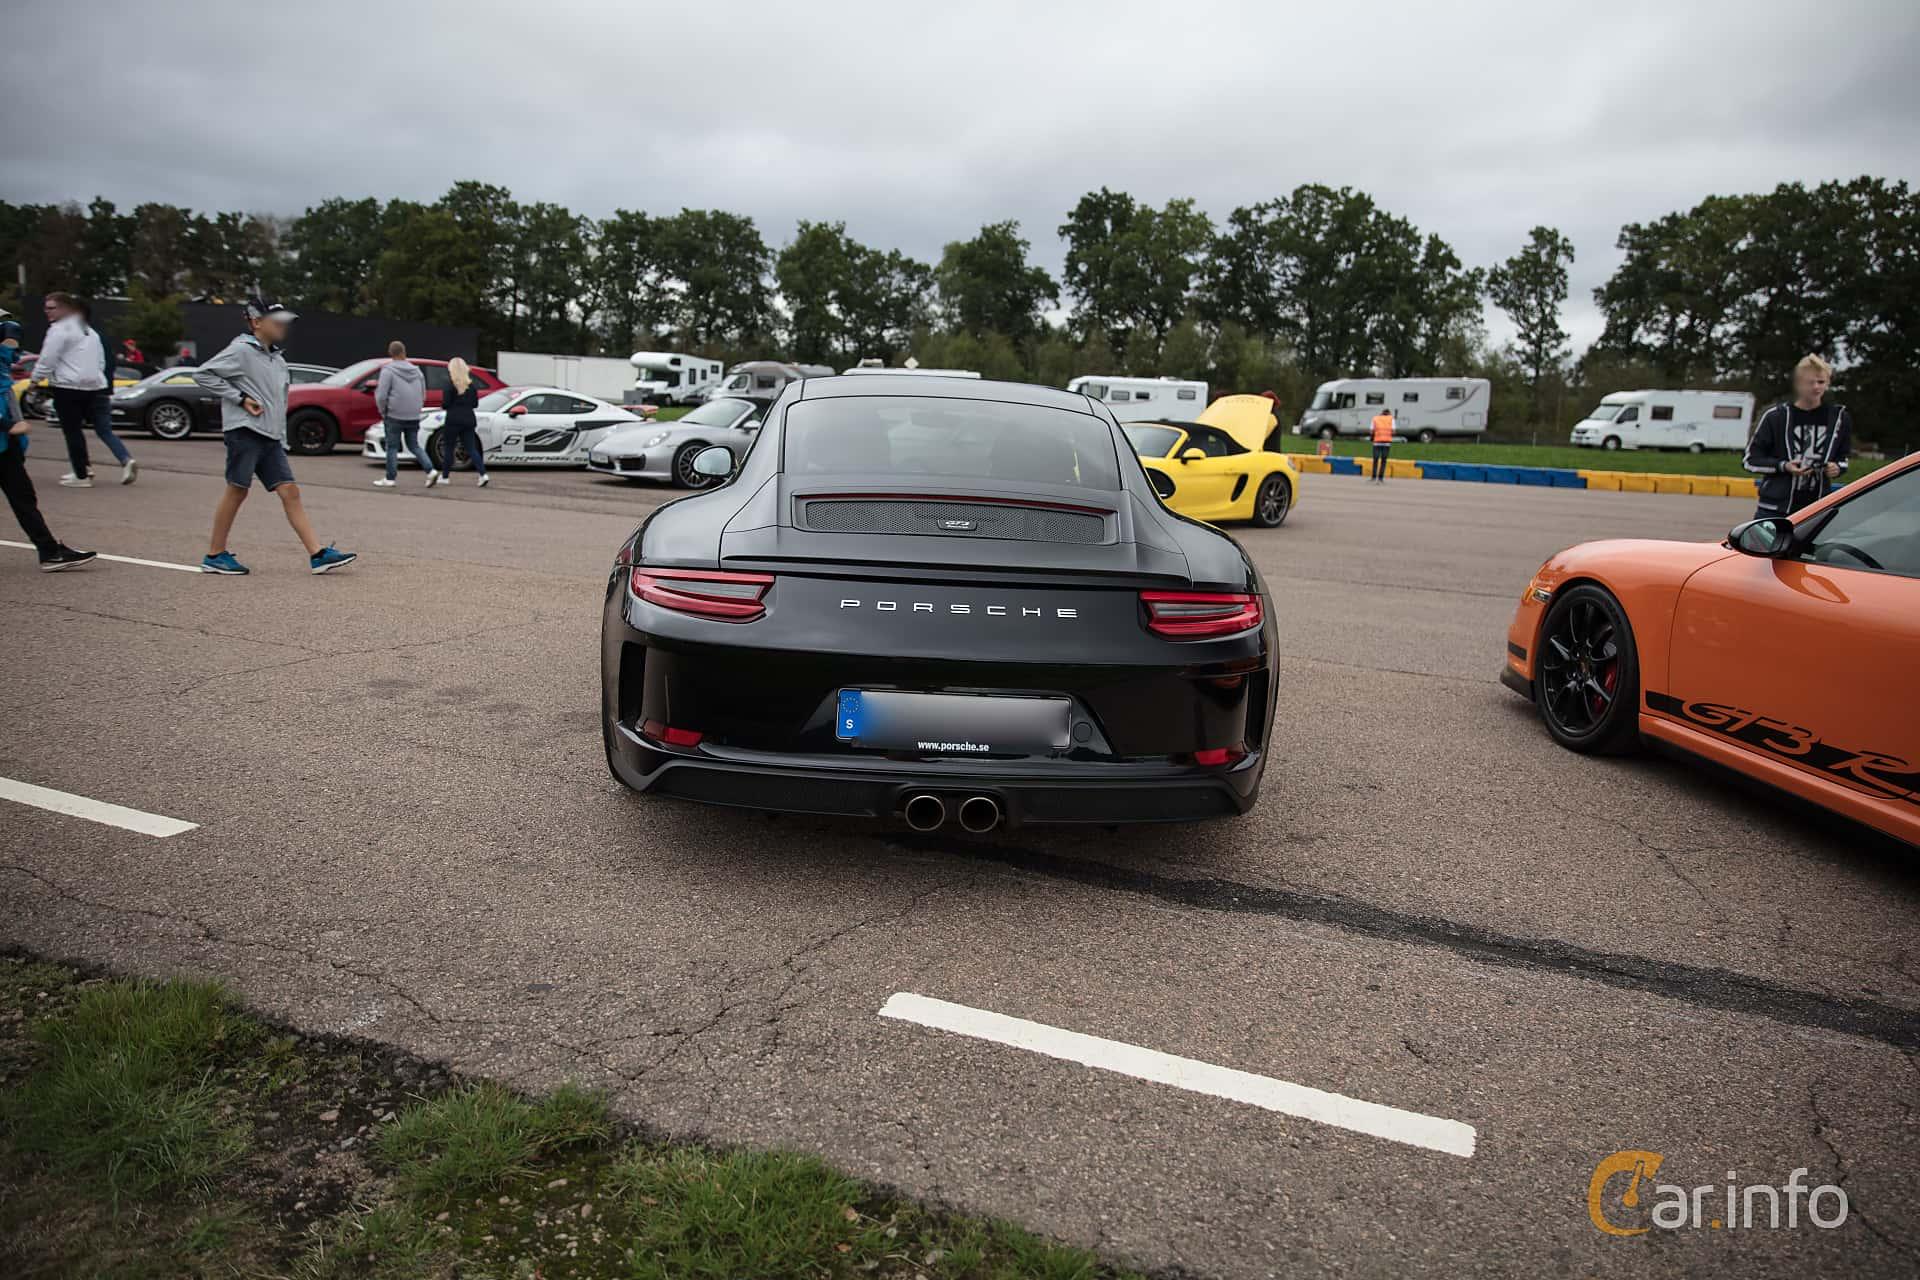 Porsche 911 GT3 4.0 H6 Manual, 500hp, 2018 at Autoropa Racing day Knutstorp 2018